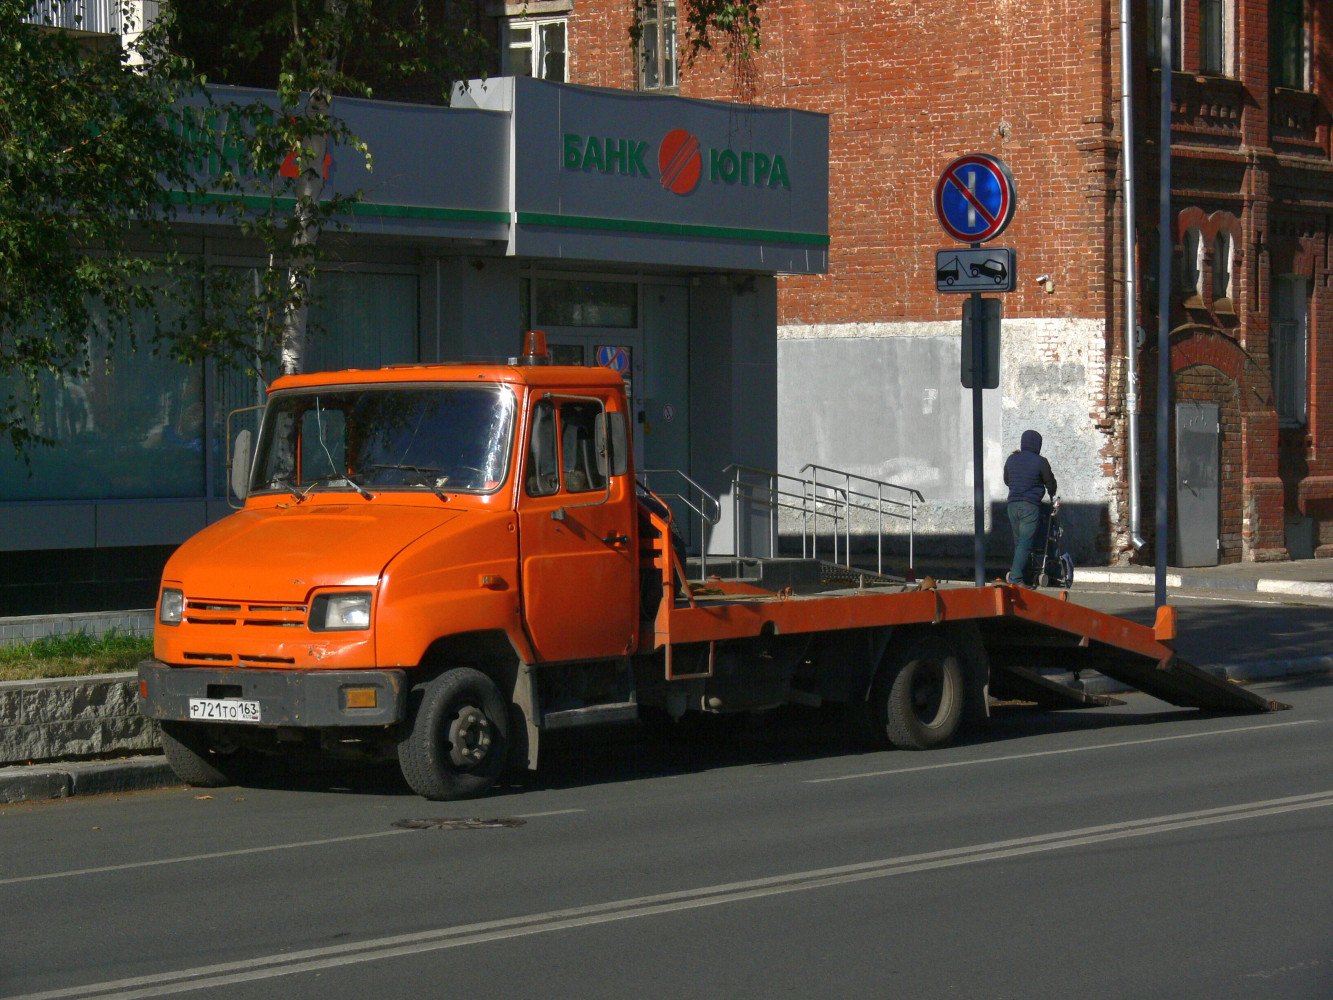 эвакуатор на шасси ЗиЛ-5301* #р 721 то 163. г. Самара, ул. Чапаевская